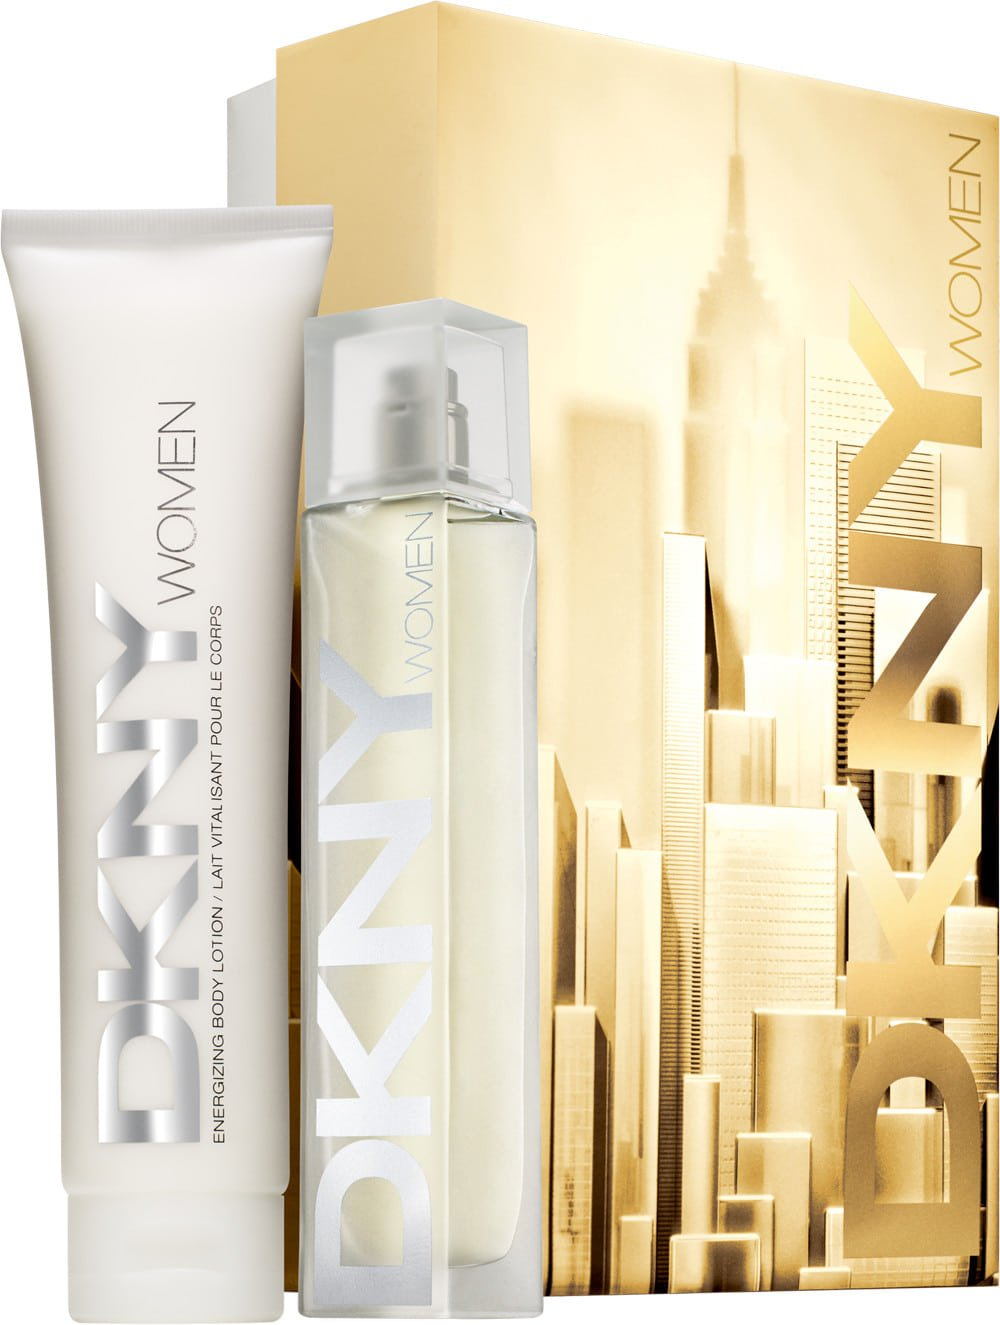 DKNY Women Eau de Parfum Gift Set 50ml Aramis